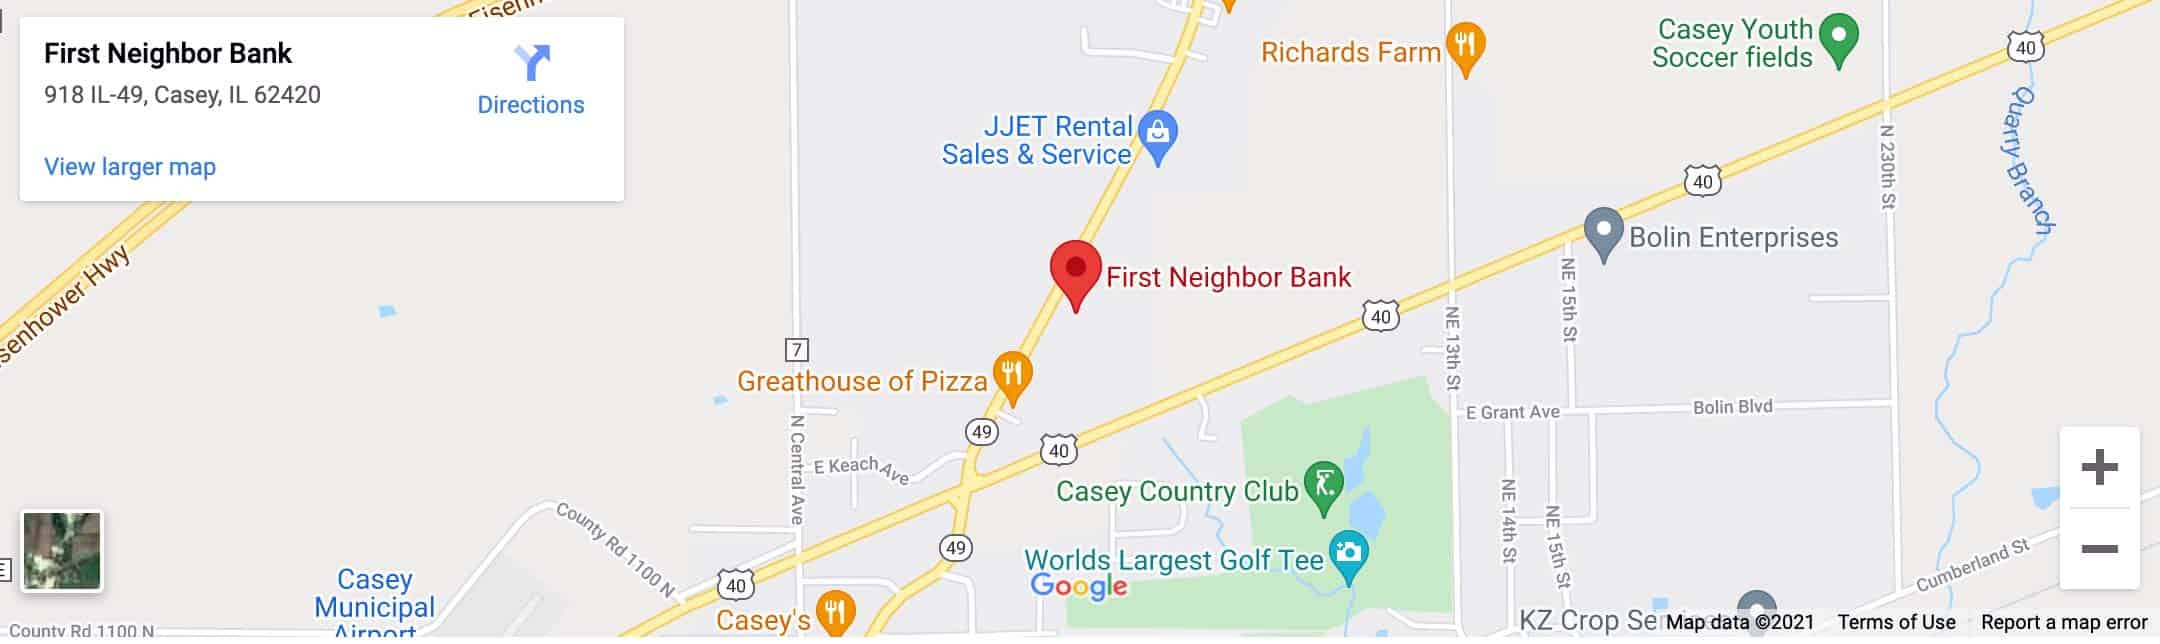 Decorative - Casey Branch Google Map Image